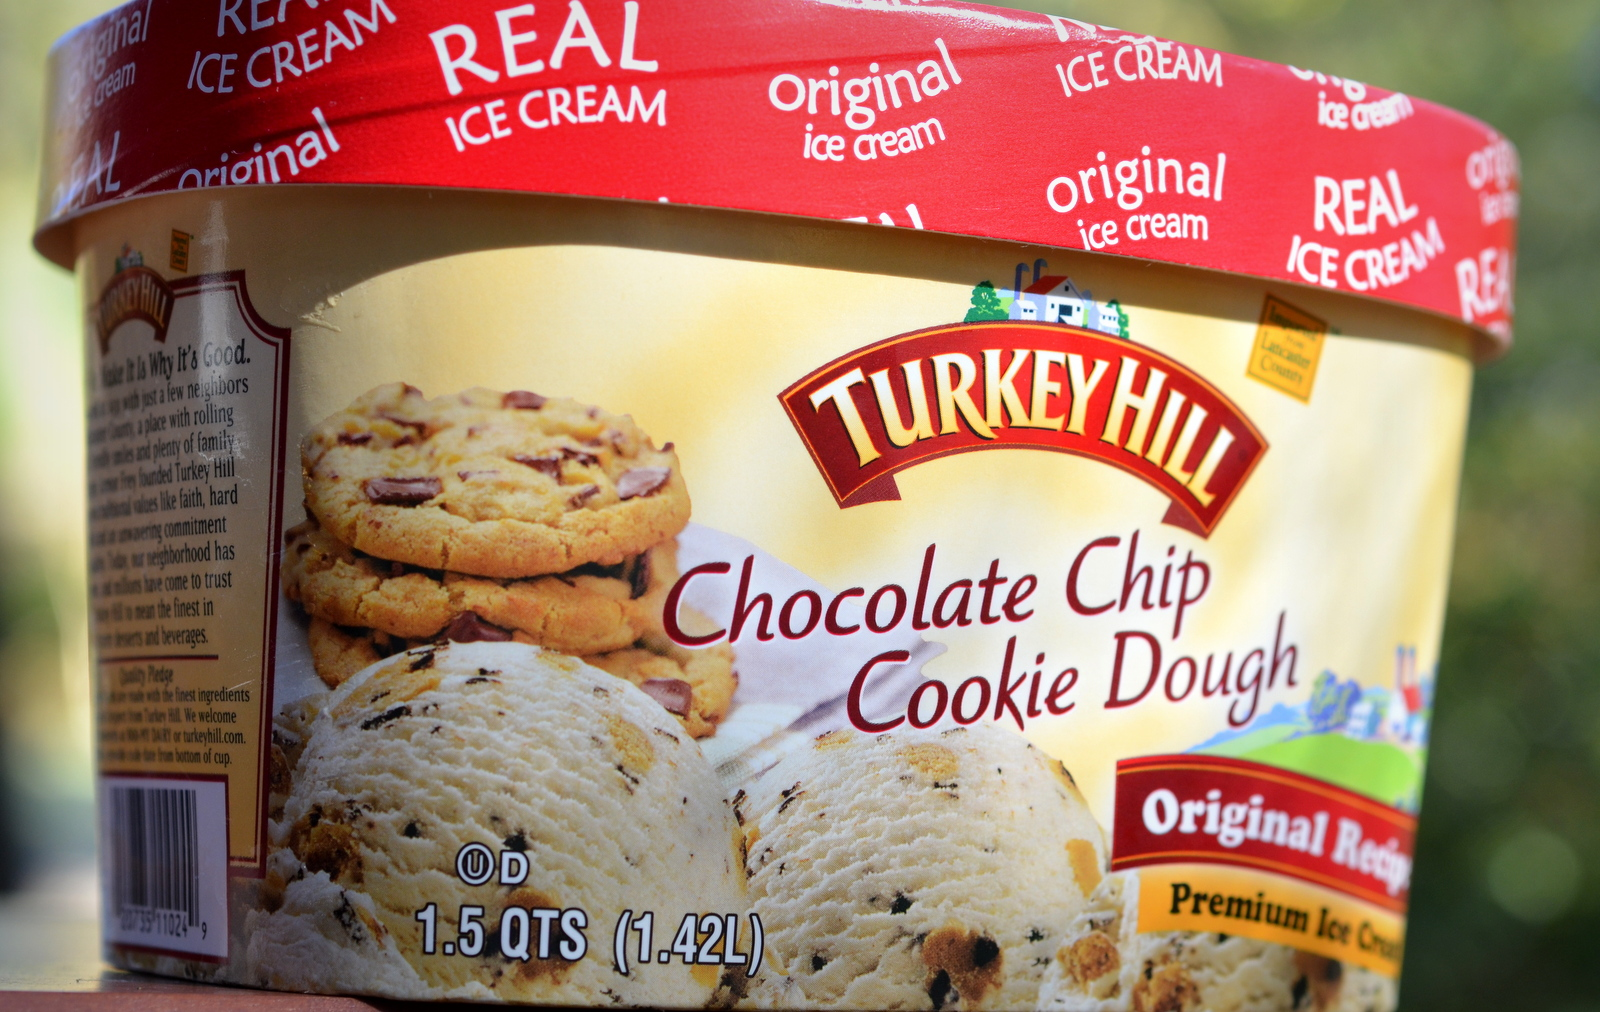 Favorite Ice Cream aka the Ice Cream thread Food Drink Game